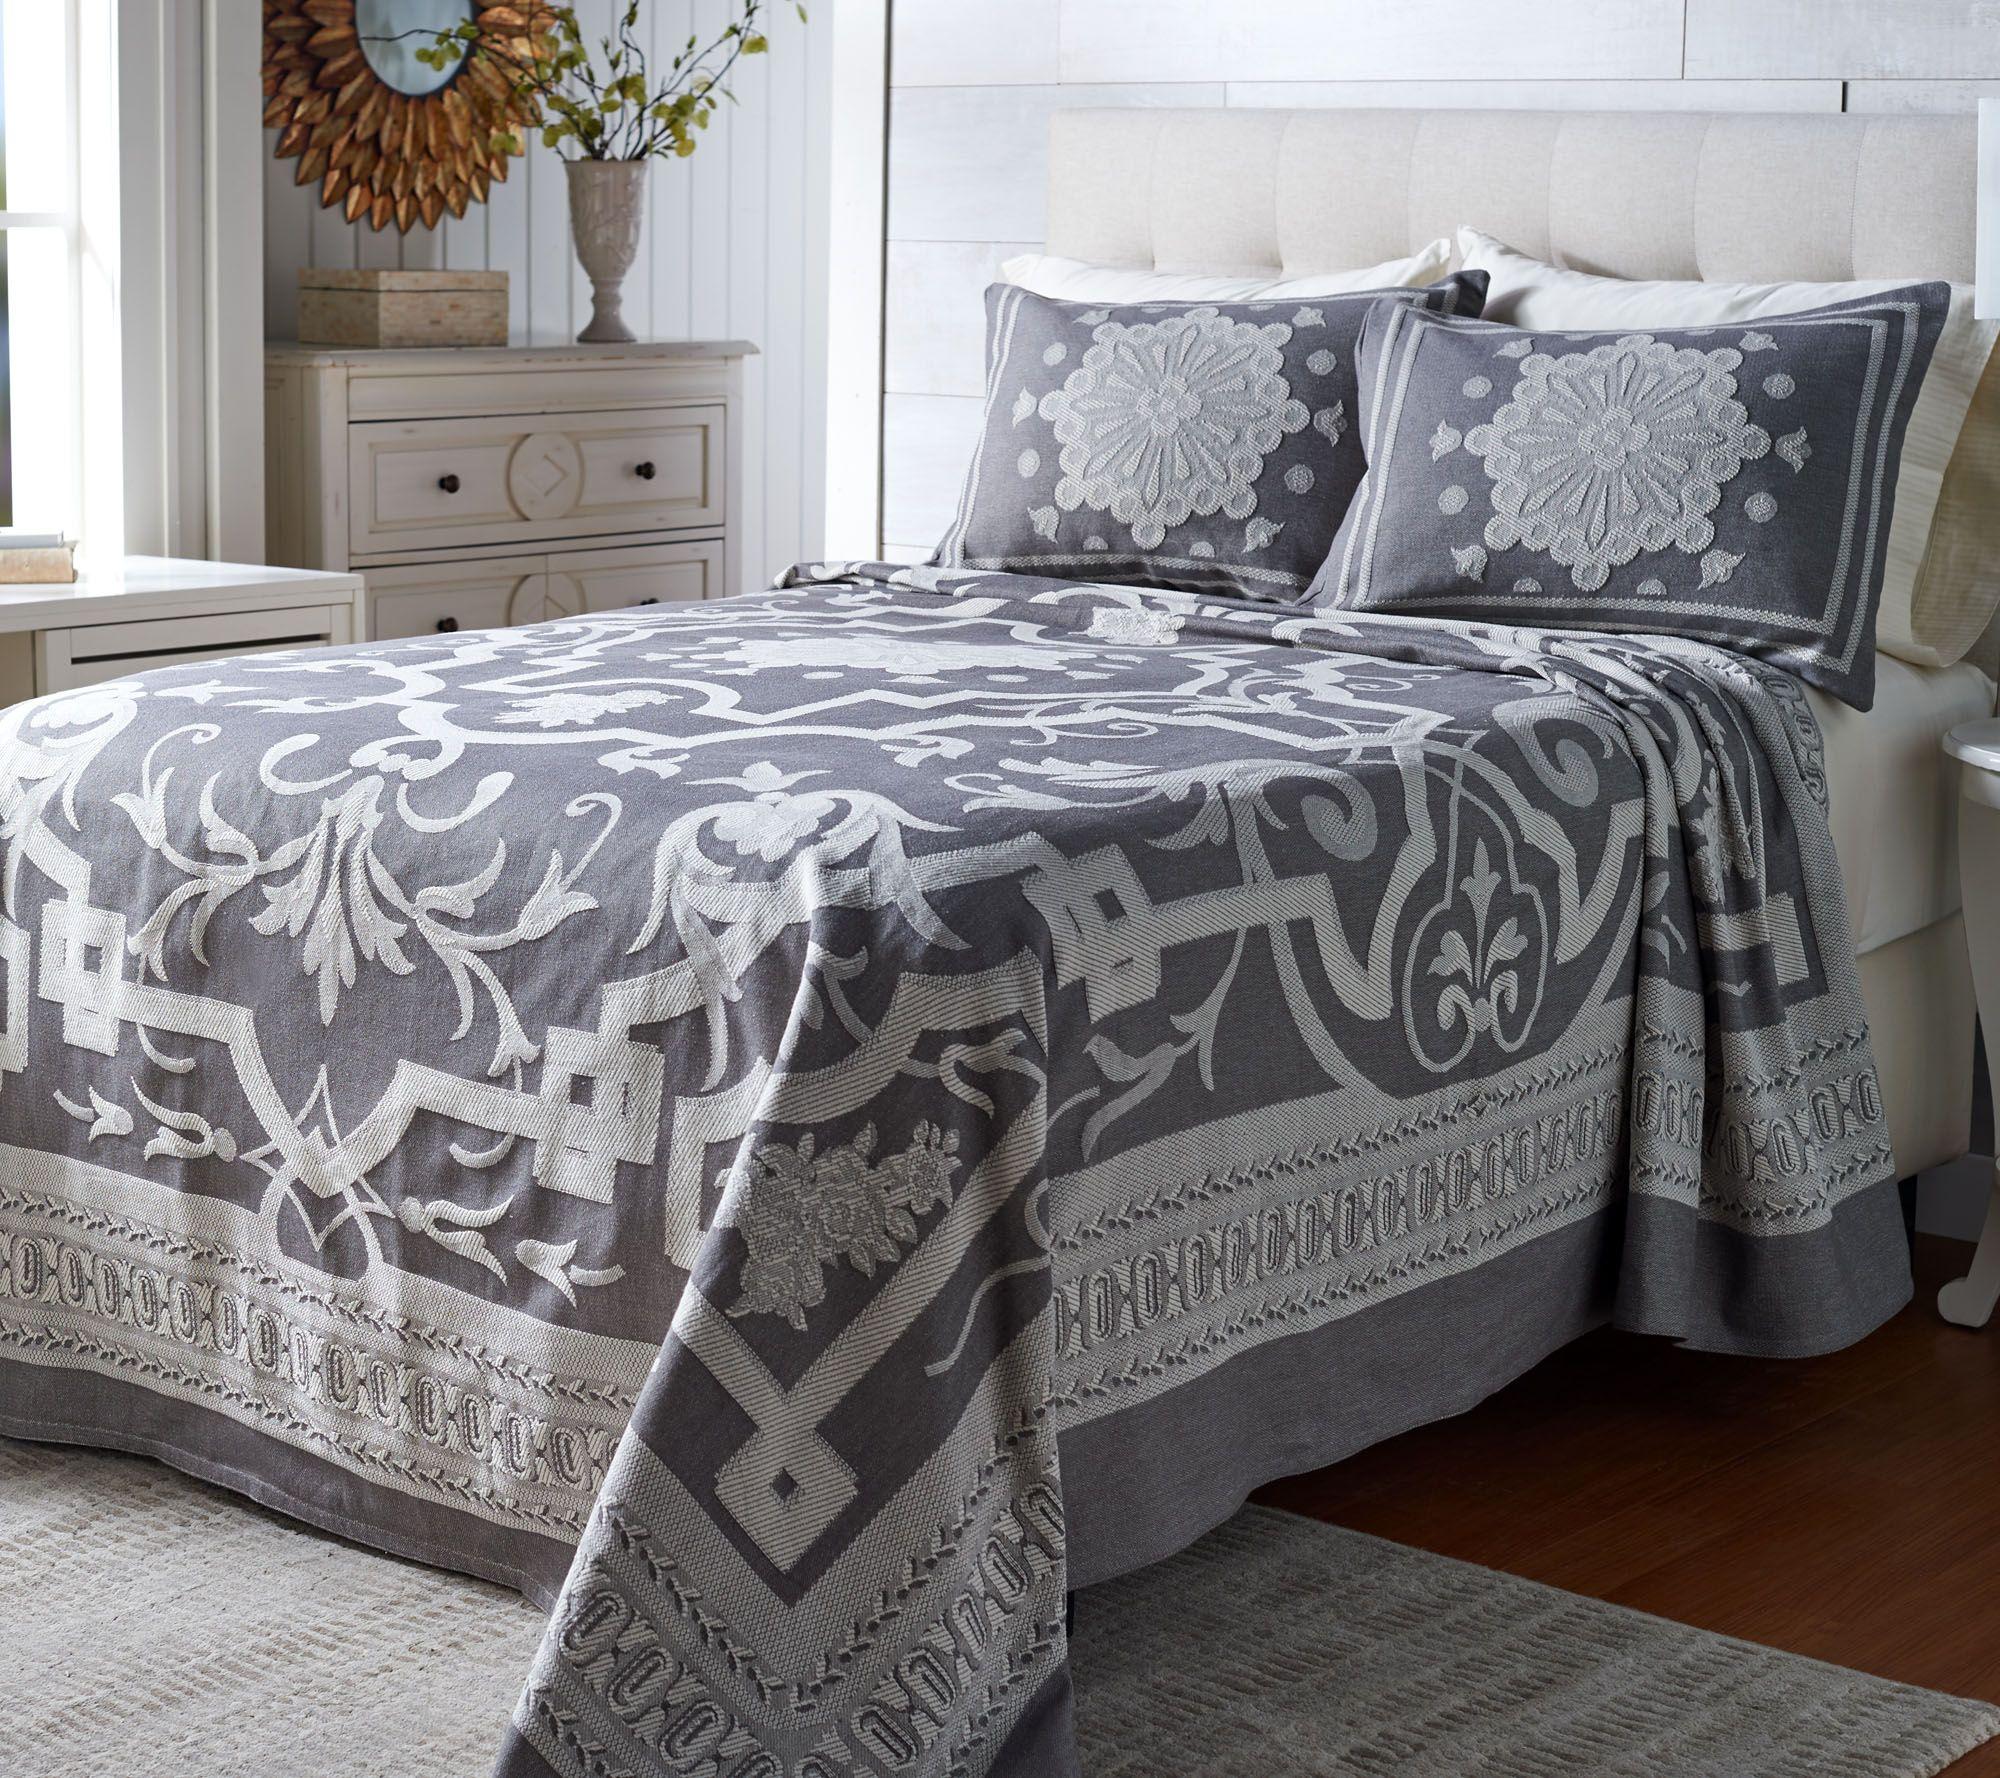 Bedspreads - Bedspread Sets, Coverlet Sets & More — QVC.com